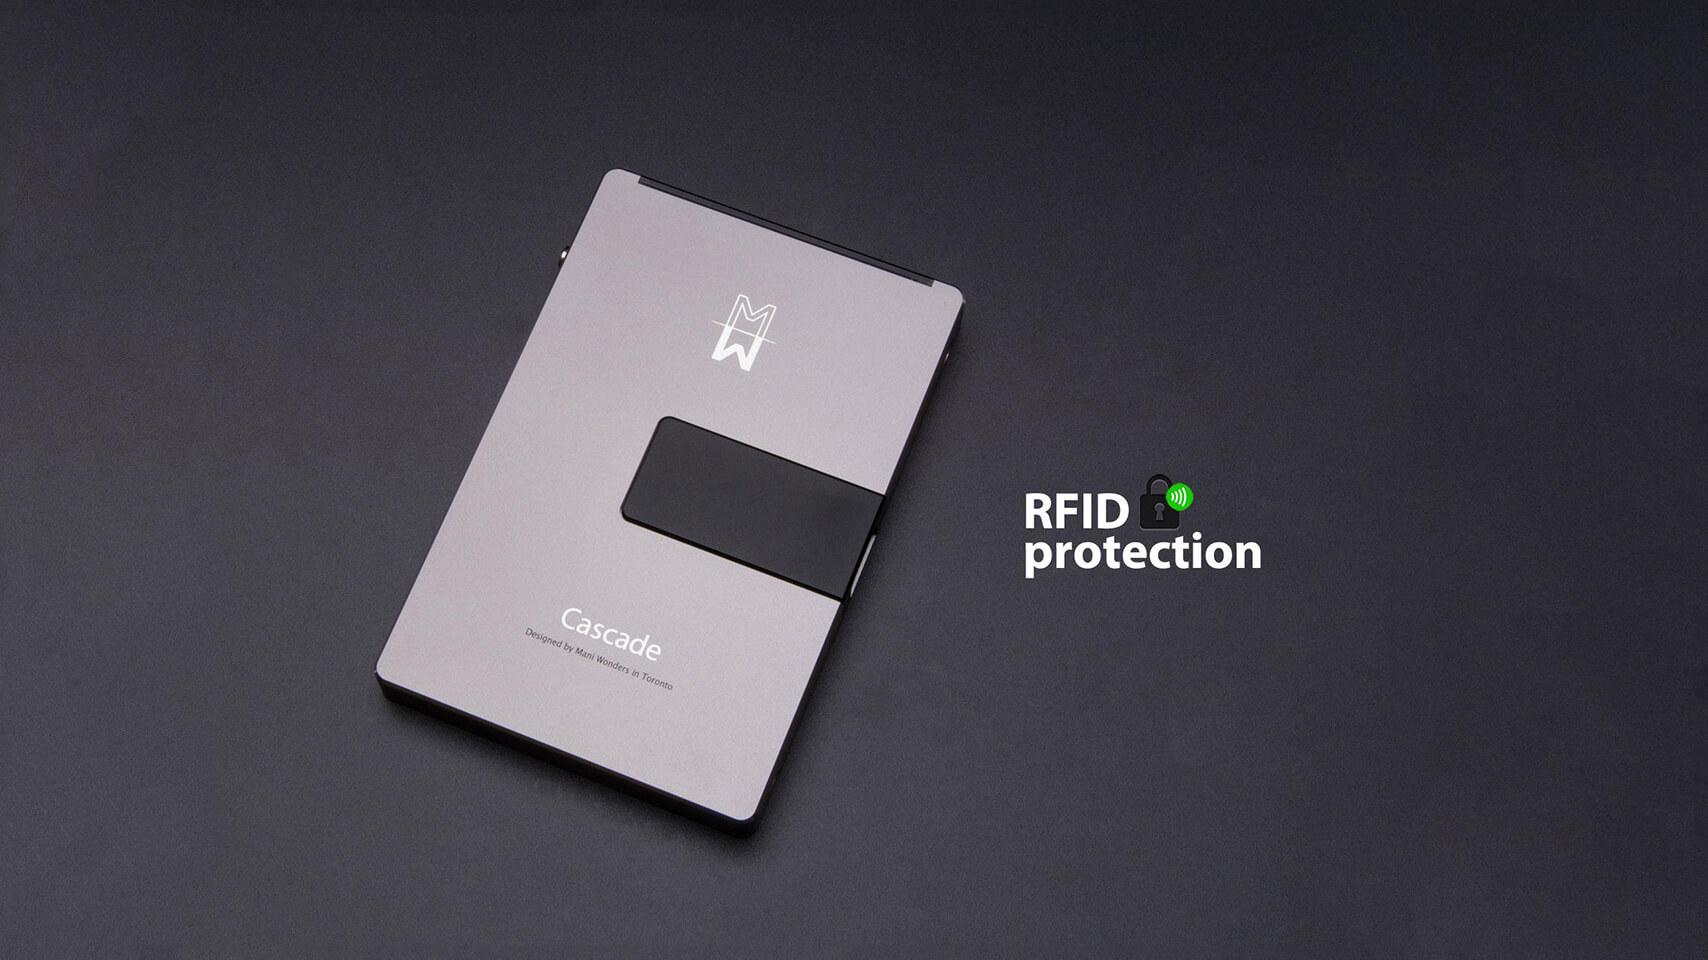 rfid cascade wallet silver